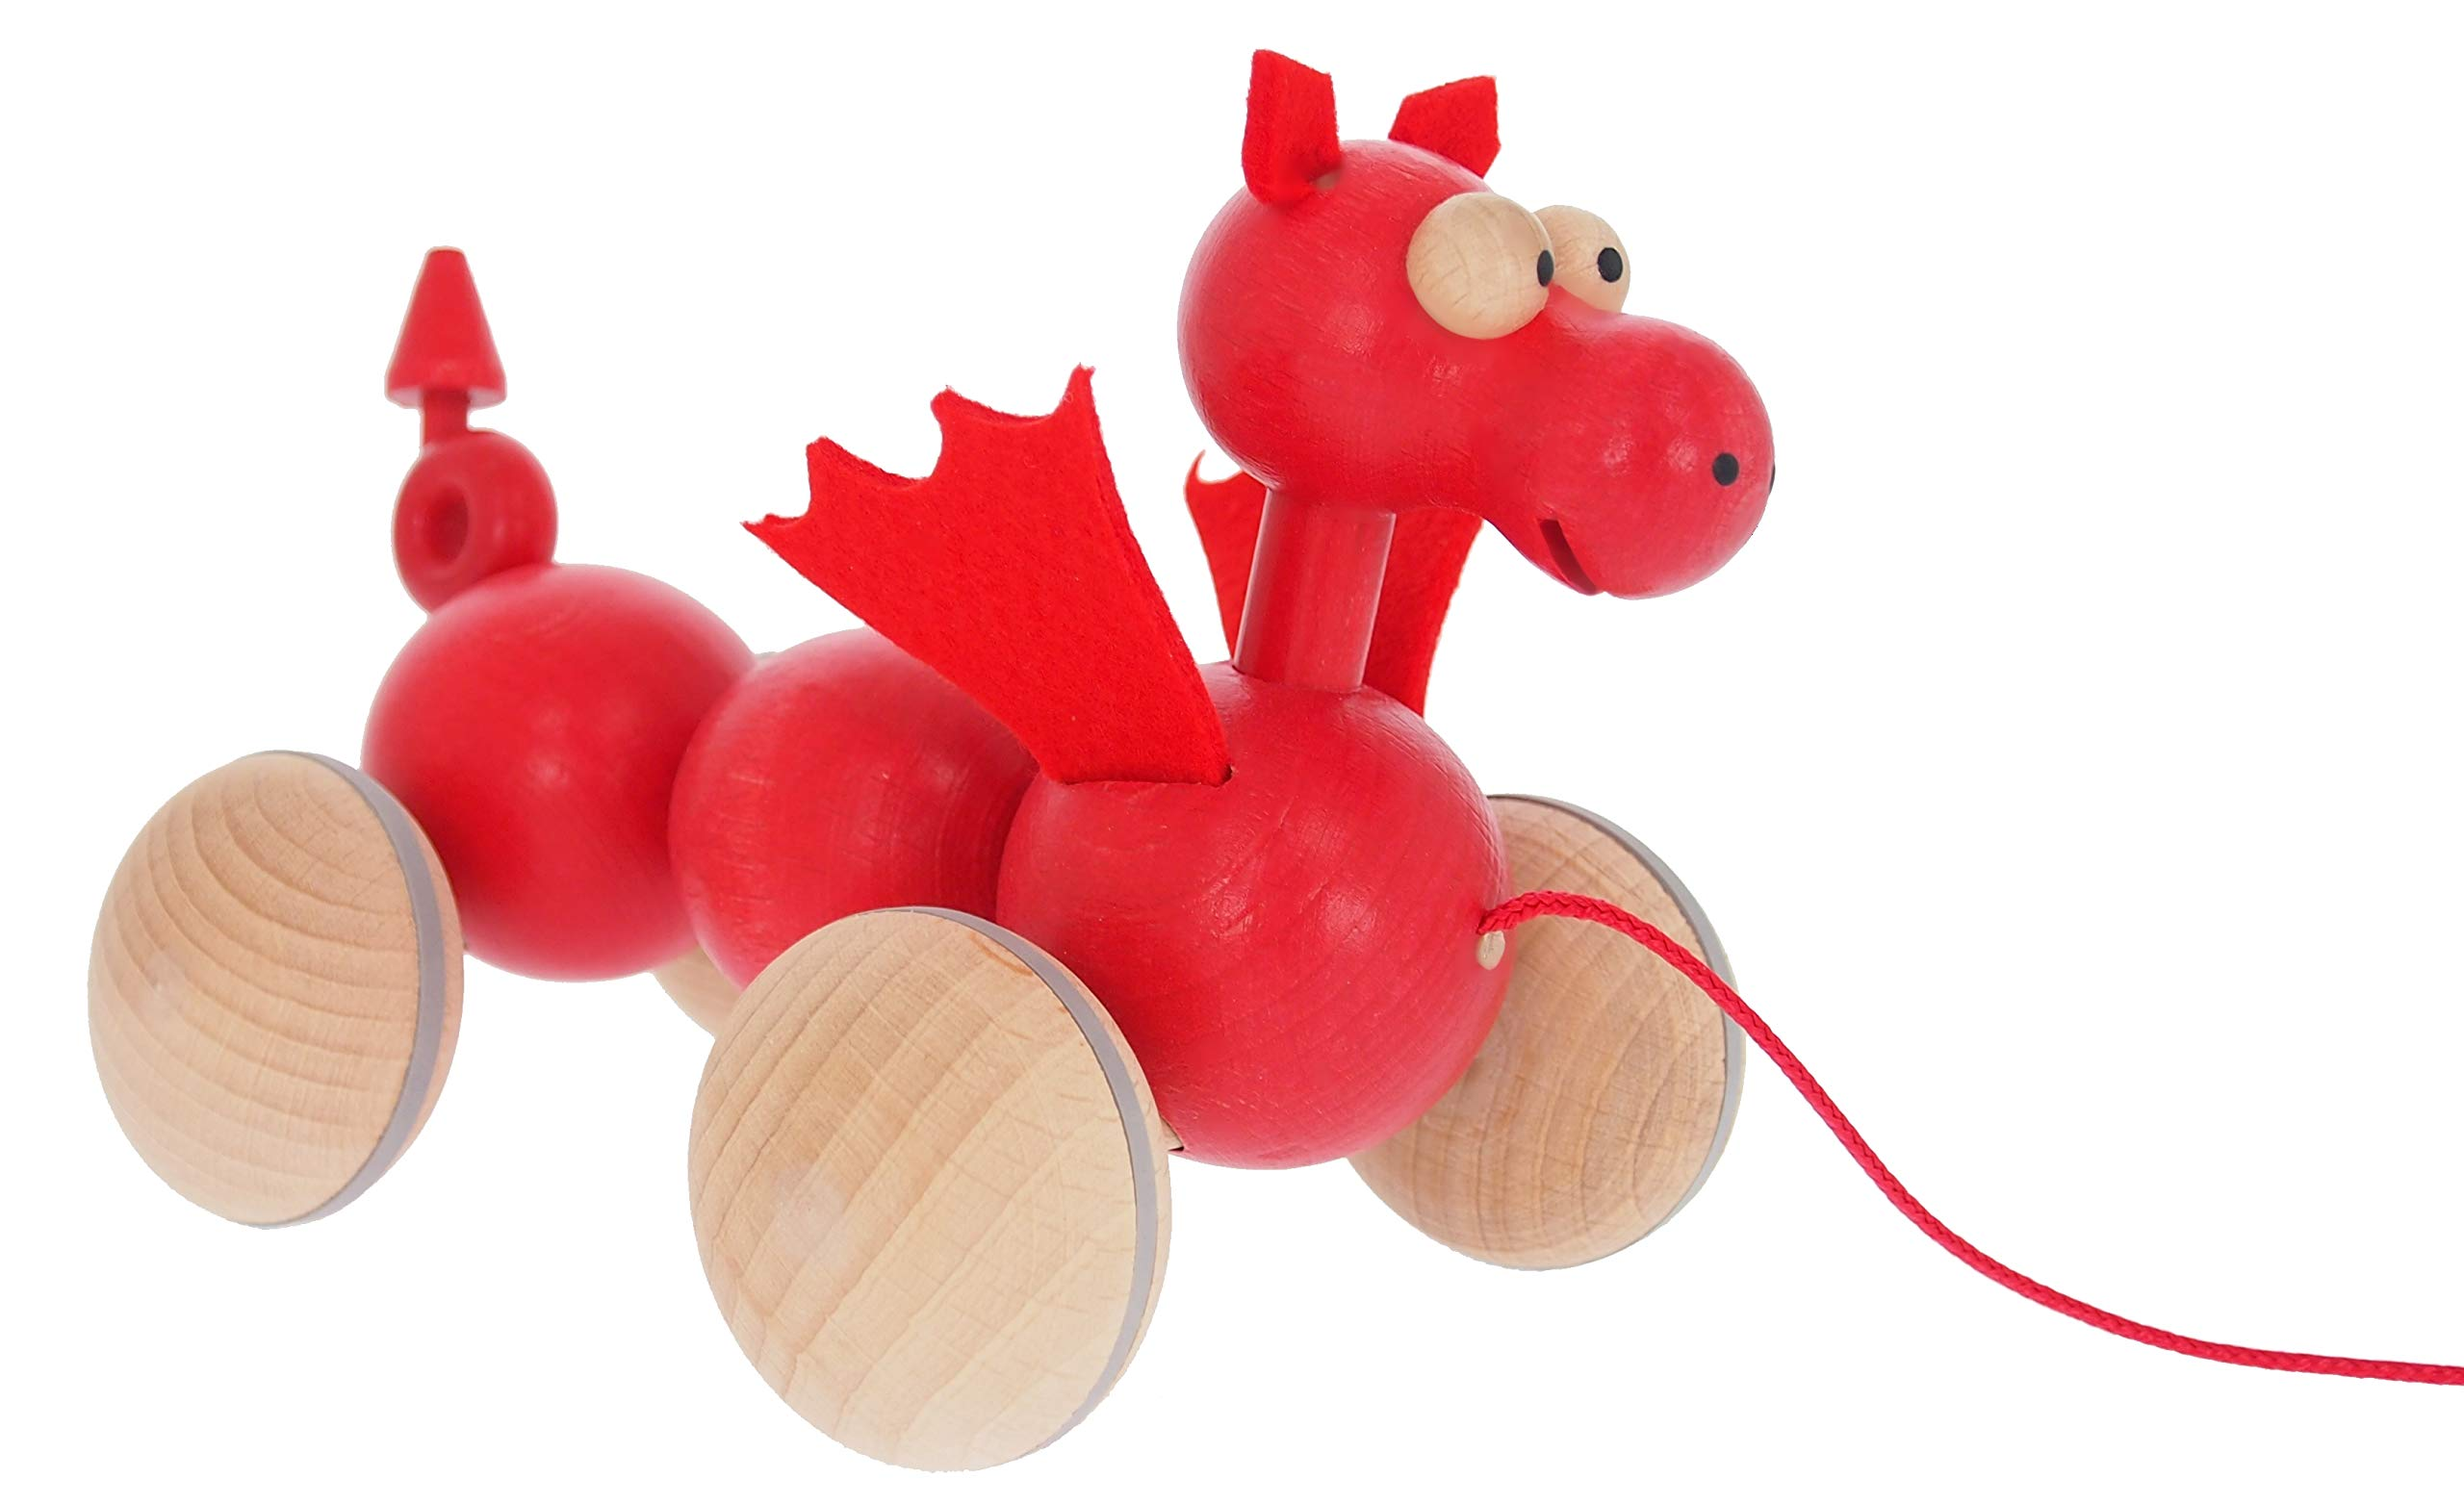 ABAfactory-68112-Nachziehtier-Walisischer-Drache-jiggling-Holz-Spielzeug